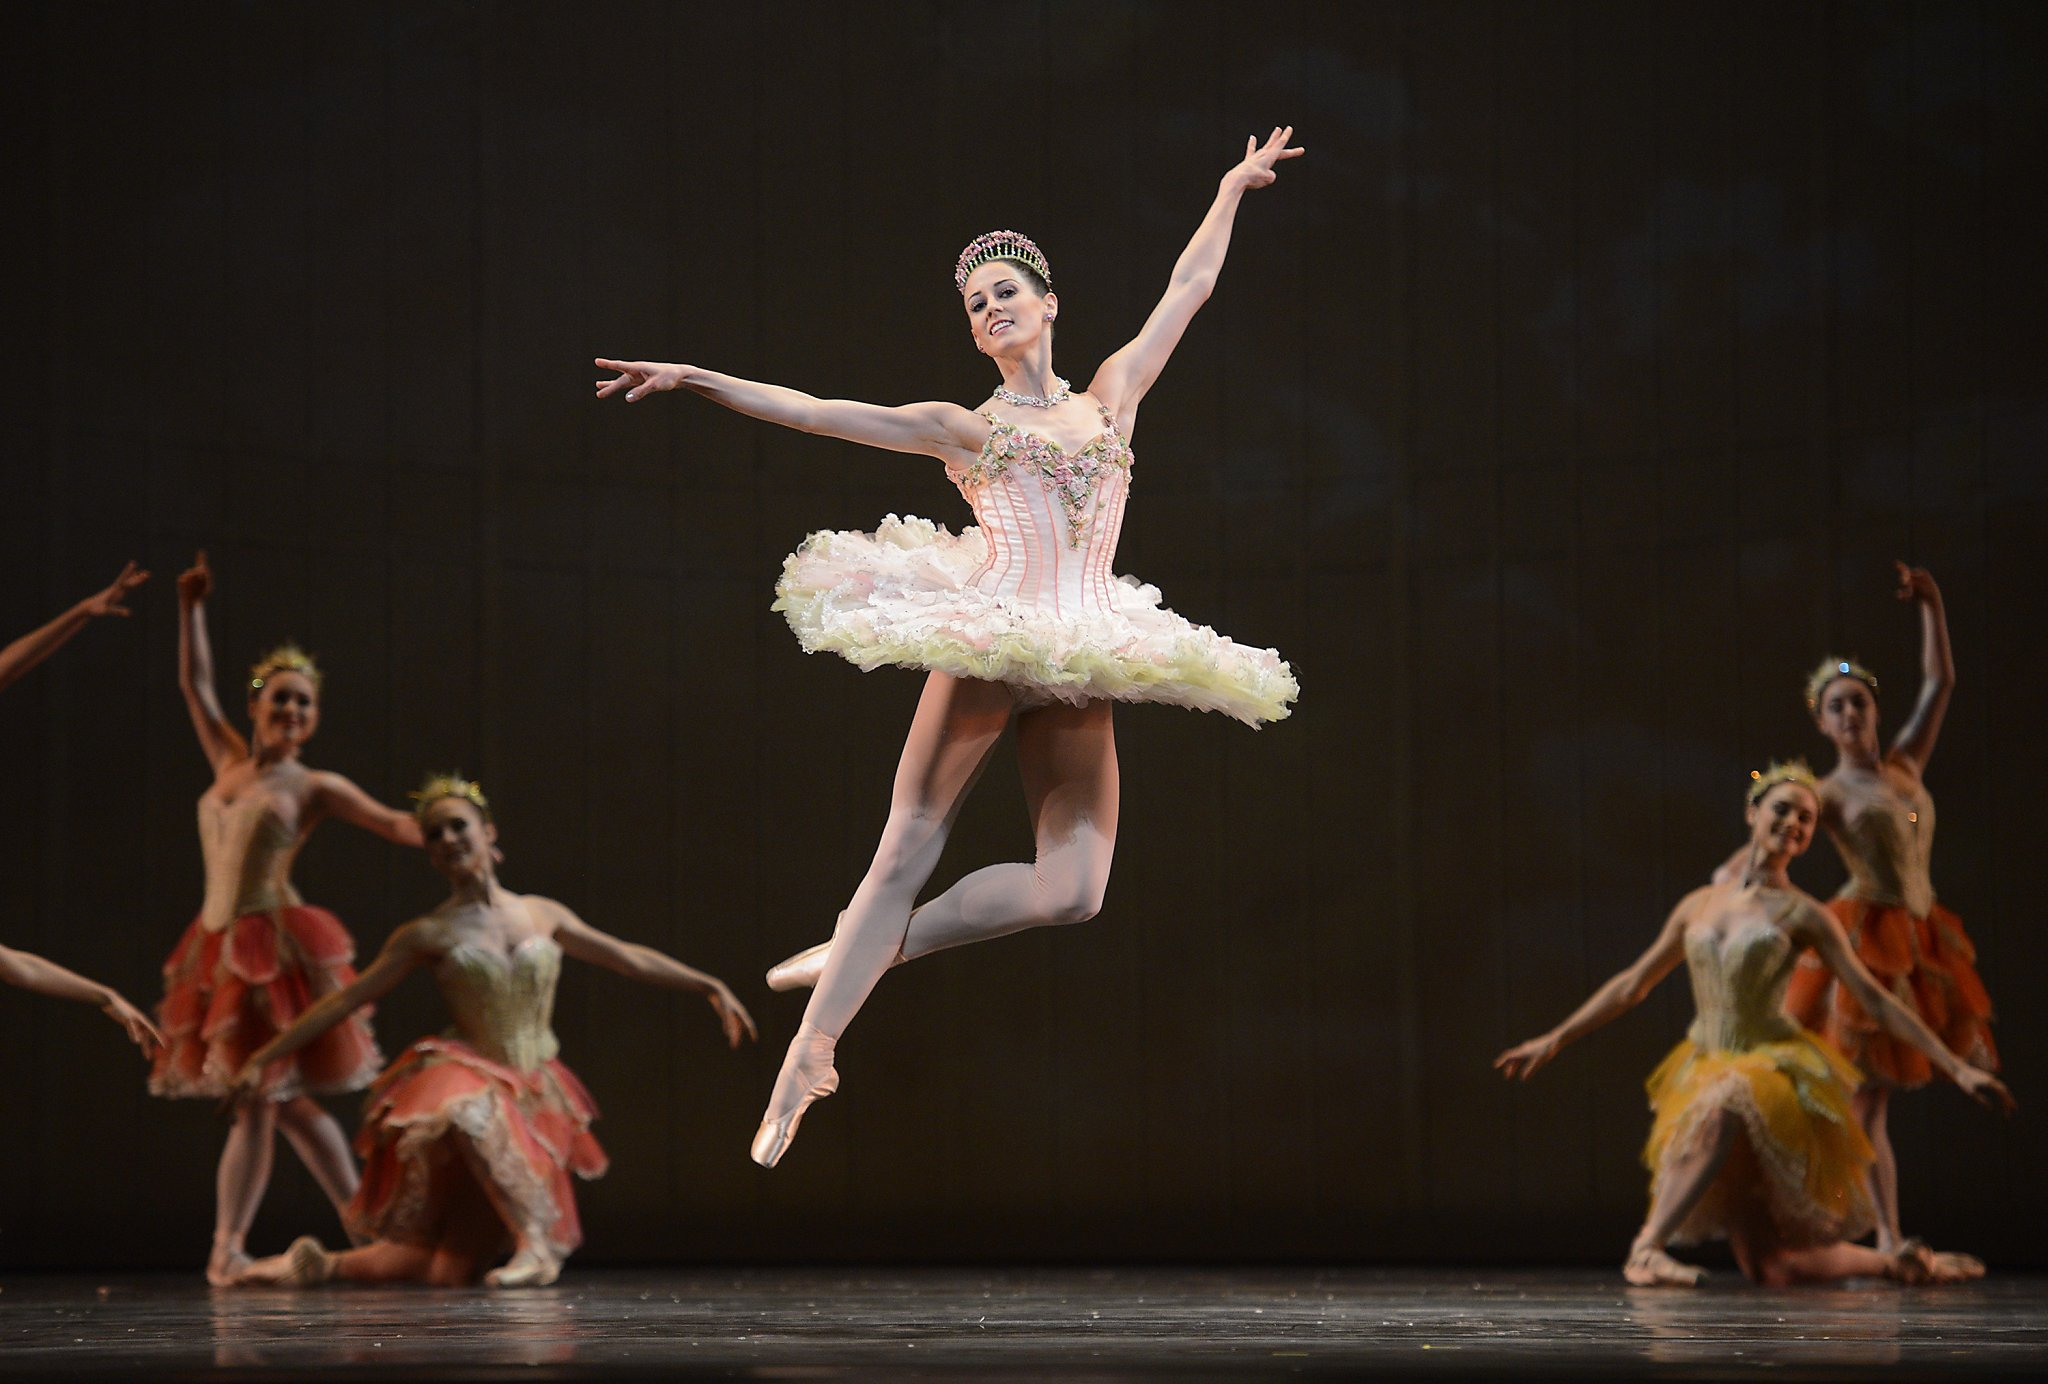 Sf nutcracker ballet 2015 fort